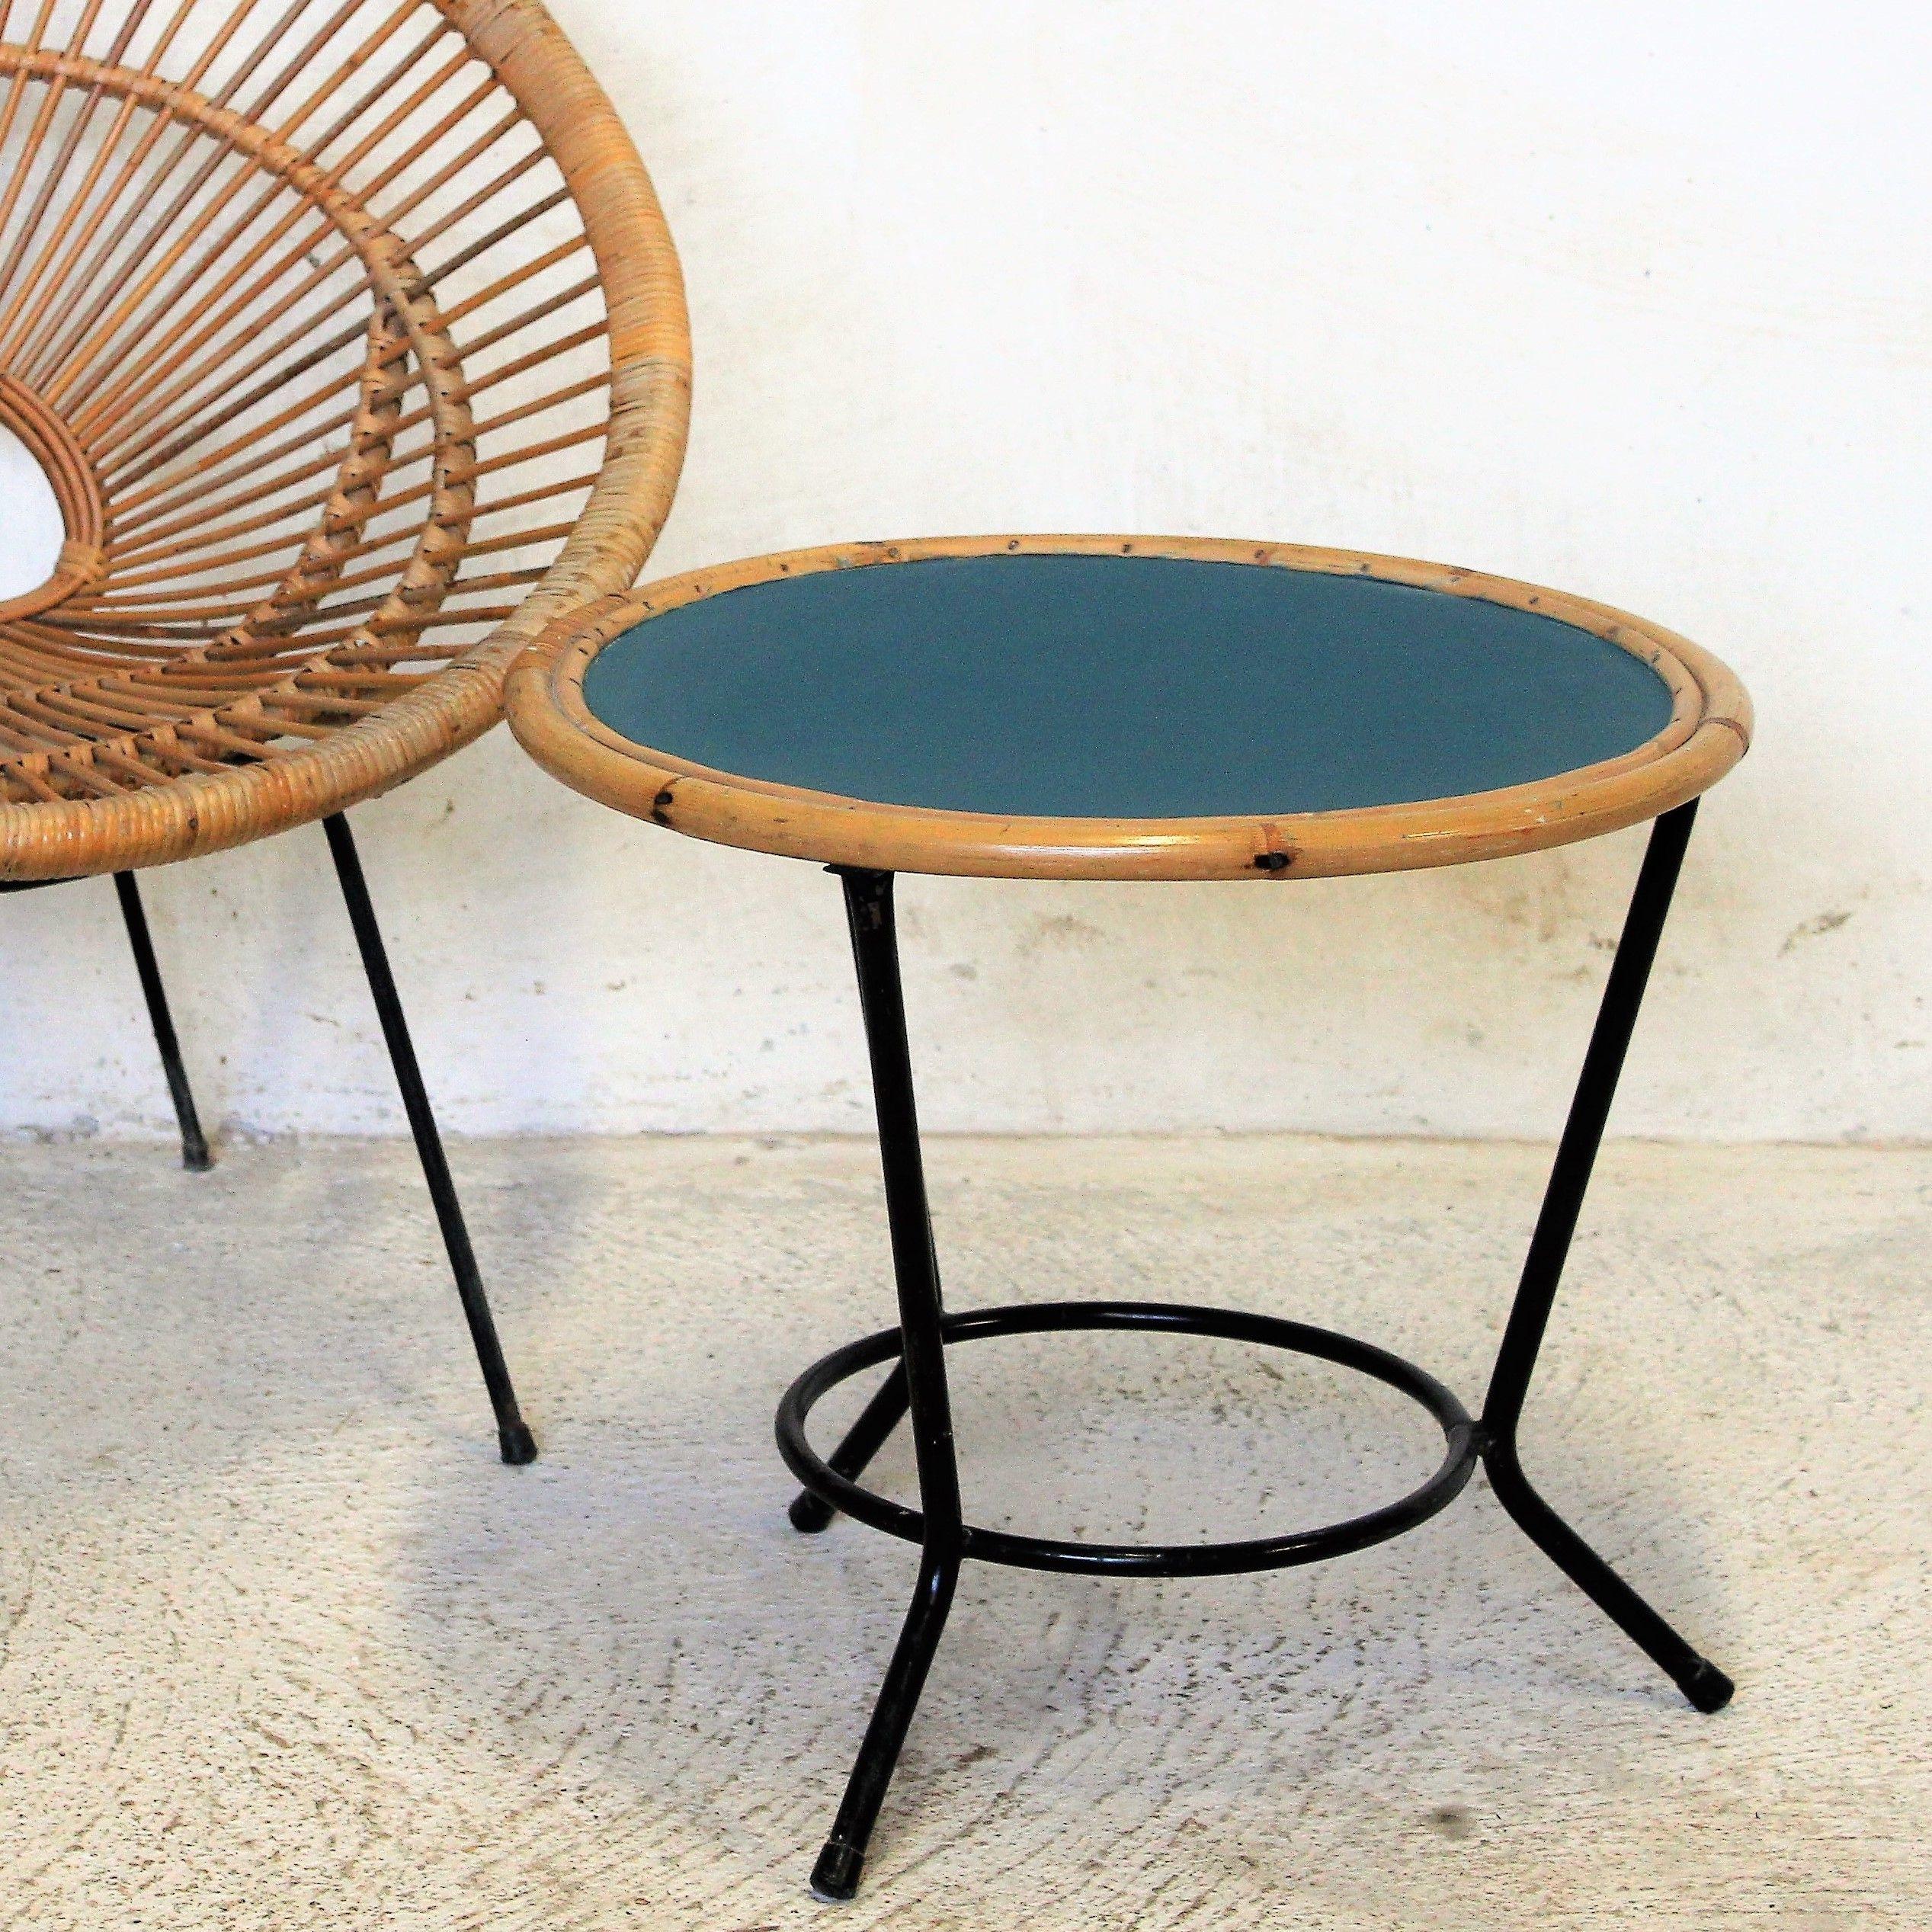 Table basse vintage rotin métal fibresendeco vannerie